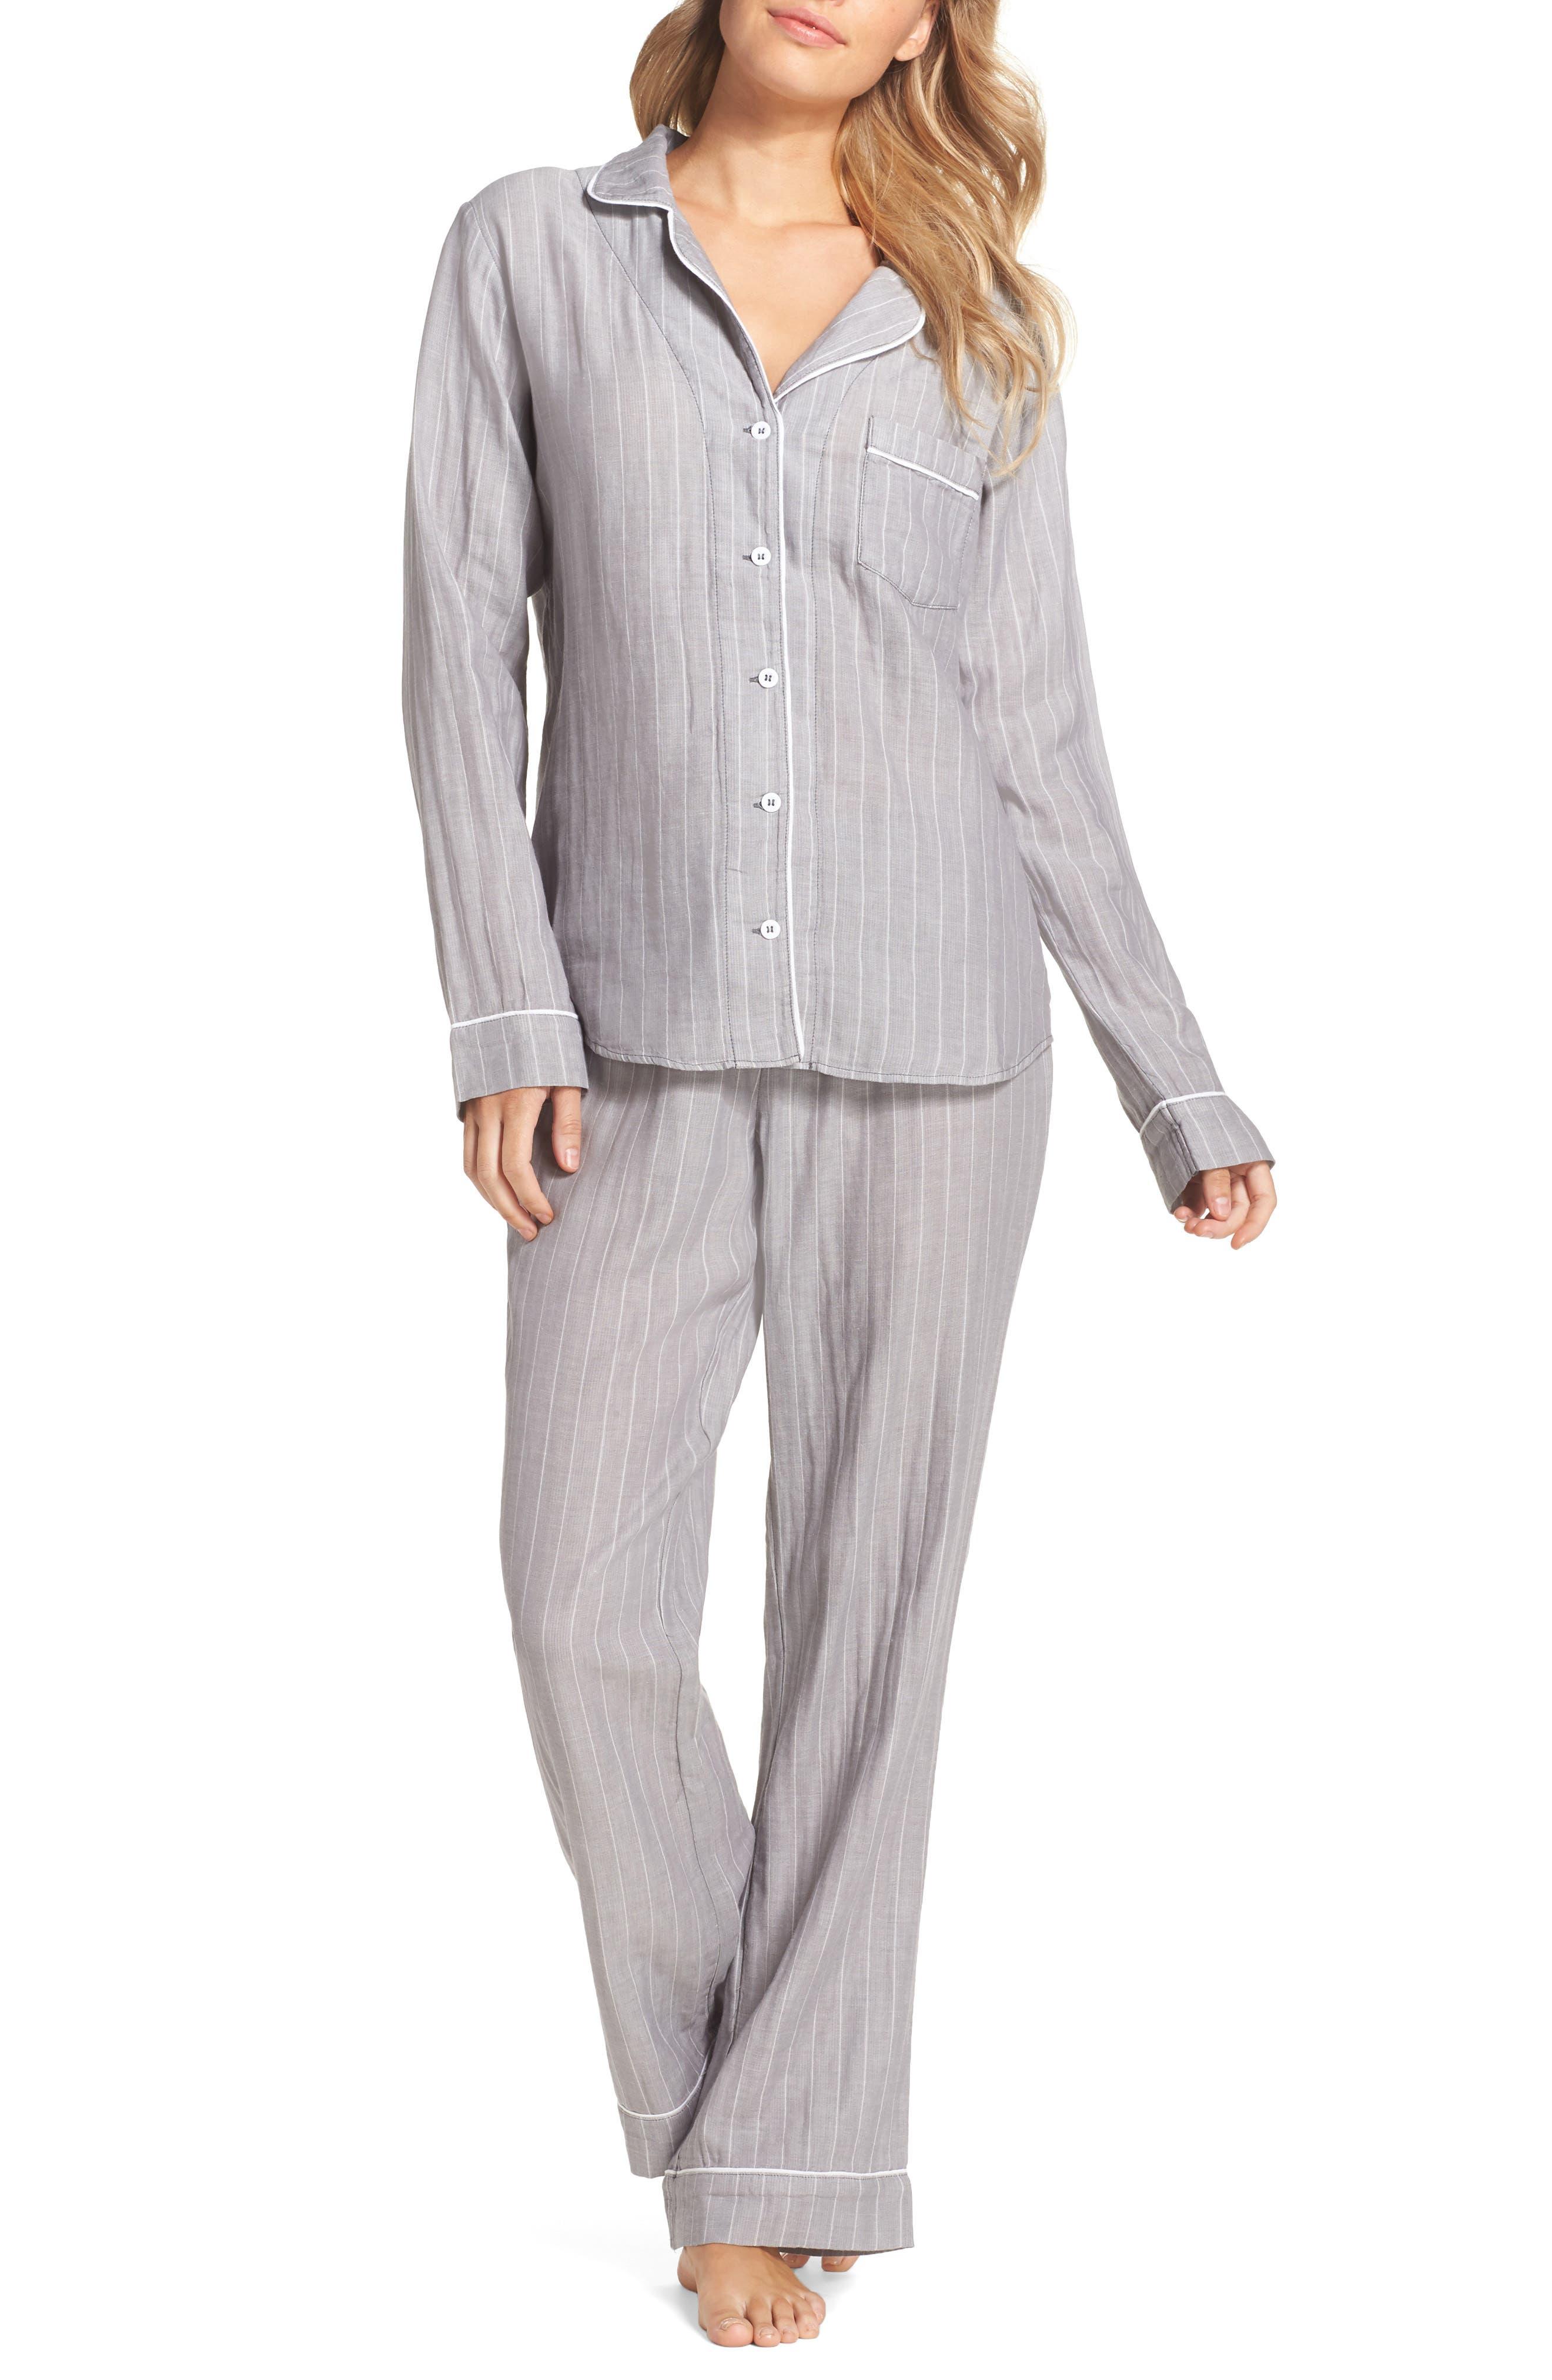 Raven Stripe Pajamas,                             Main thumbnail 1, color,                             Seal